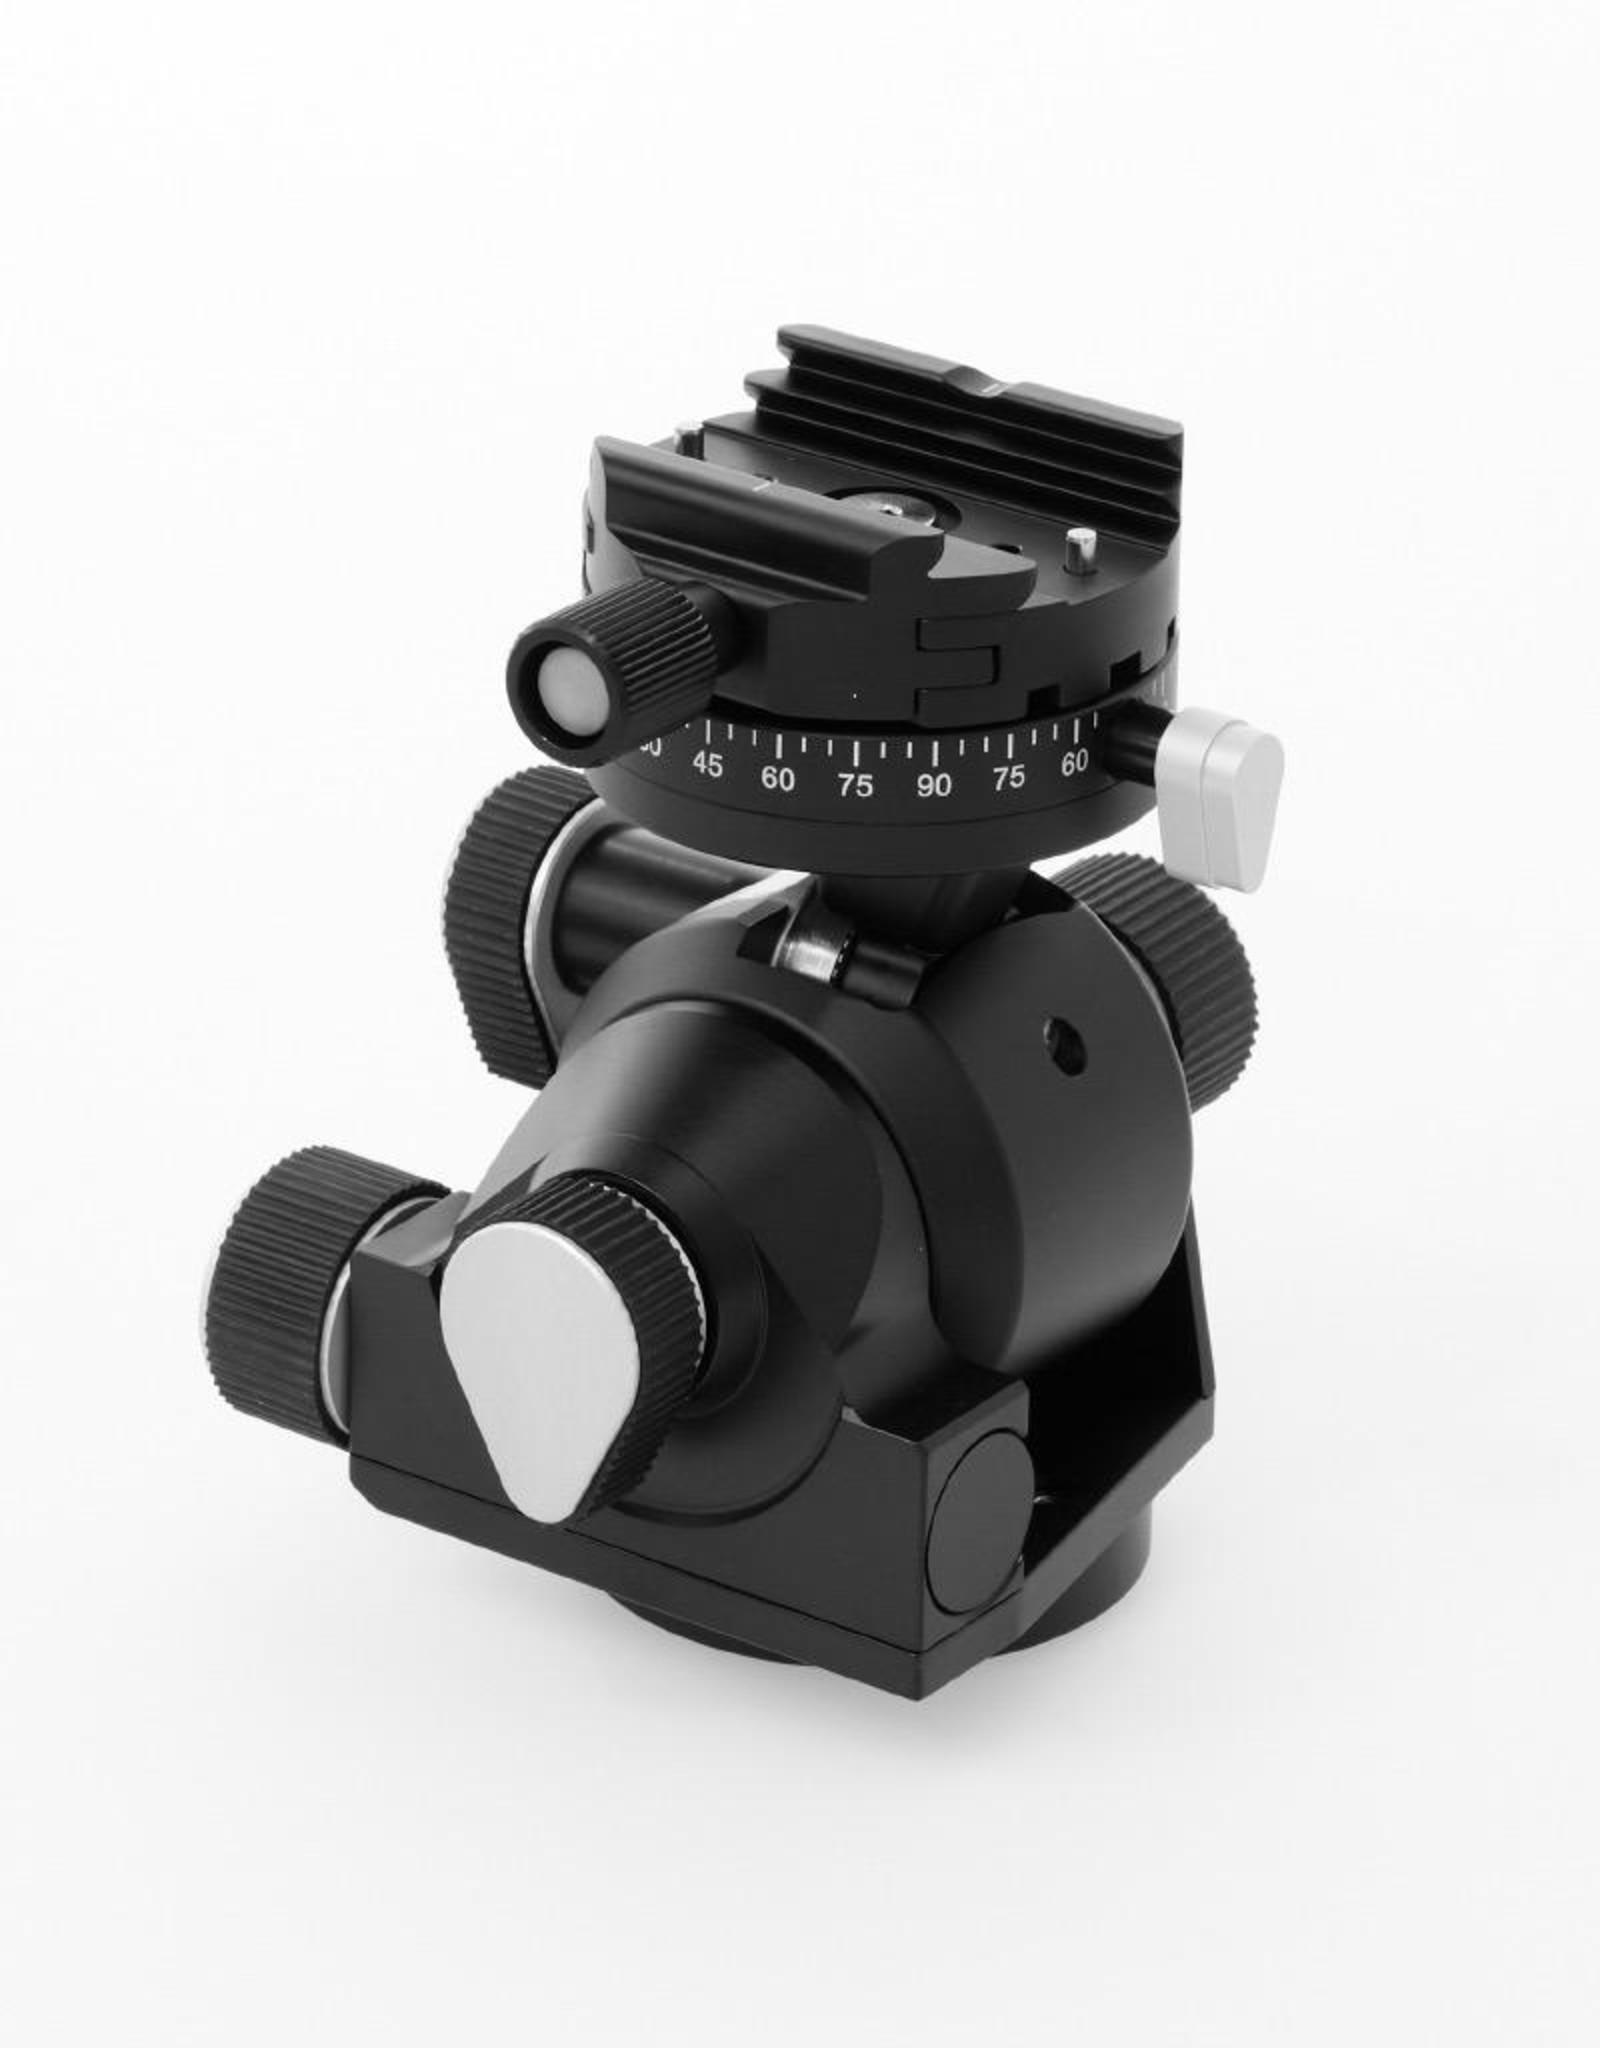 Arca Swiss ARCA-SWISS D4 (geared) quick set device Classic